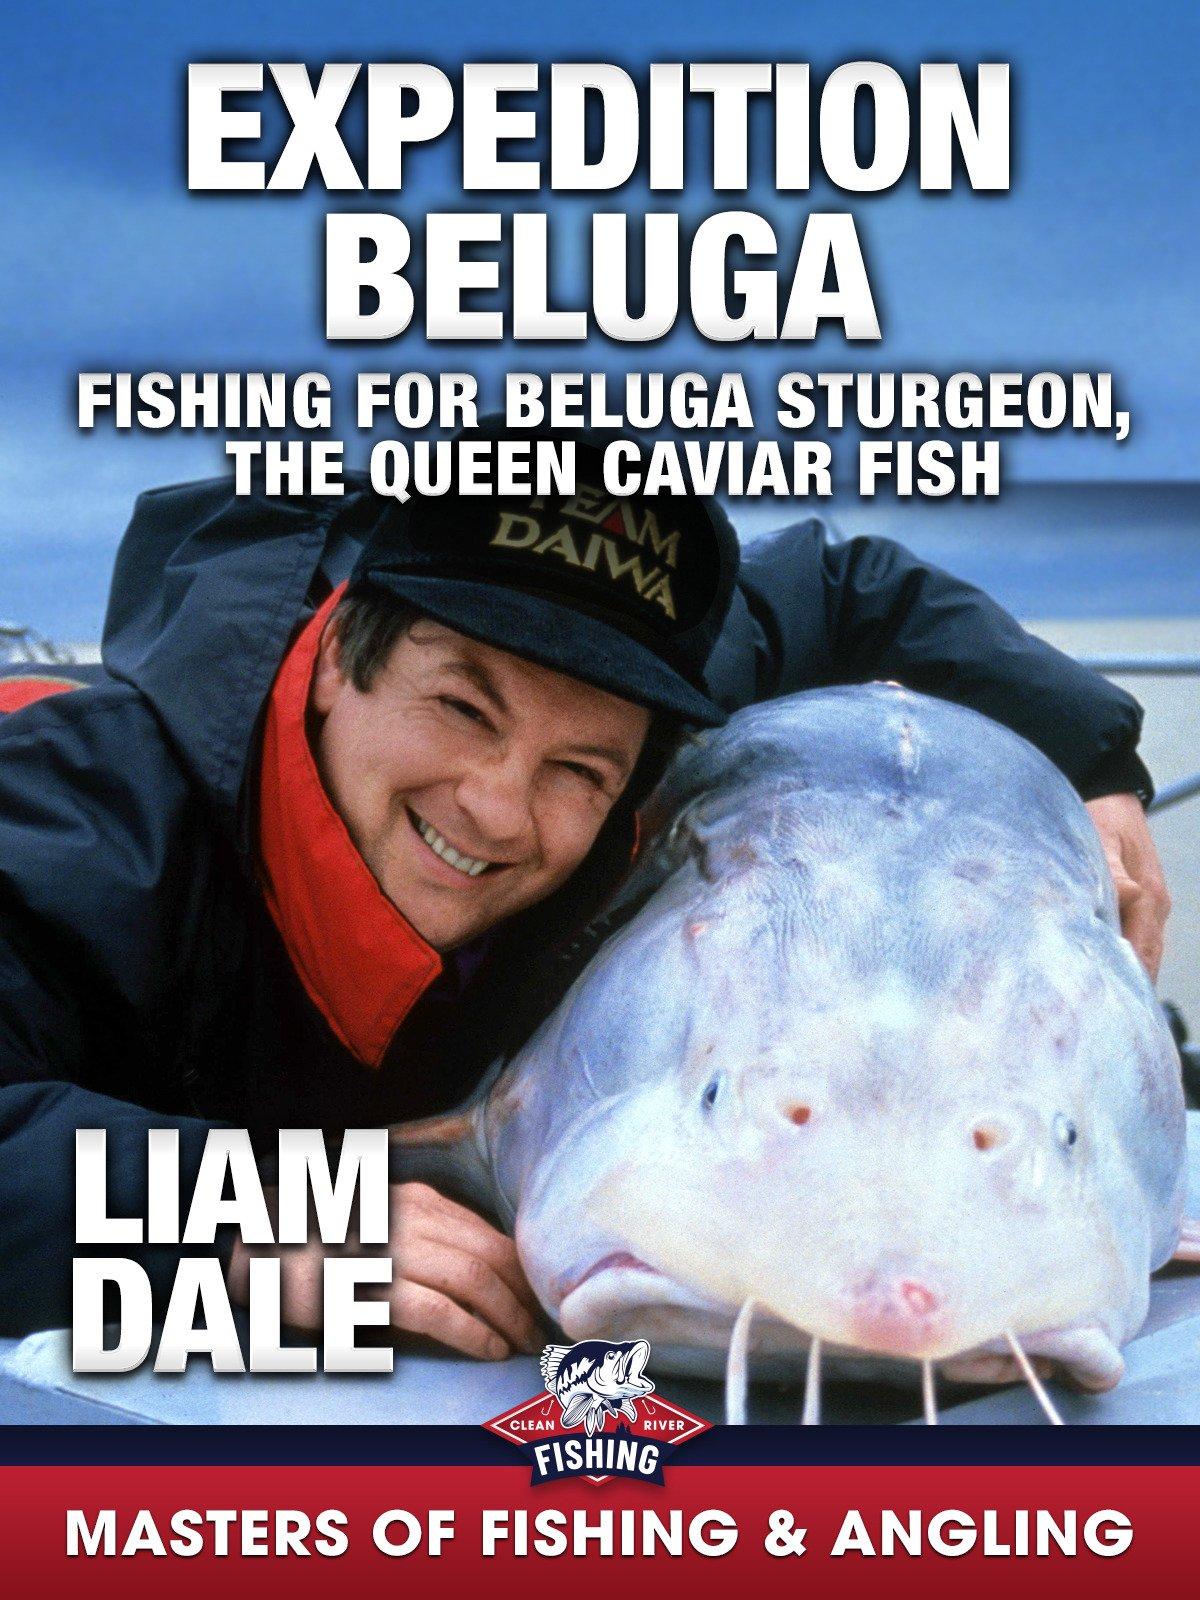 Expedition Beluga: Fishing for Beluga Sturgeon, the Queen Caviar Fish